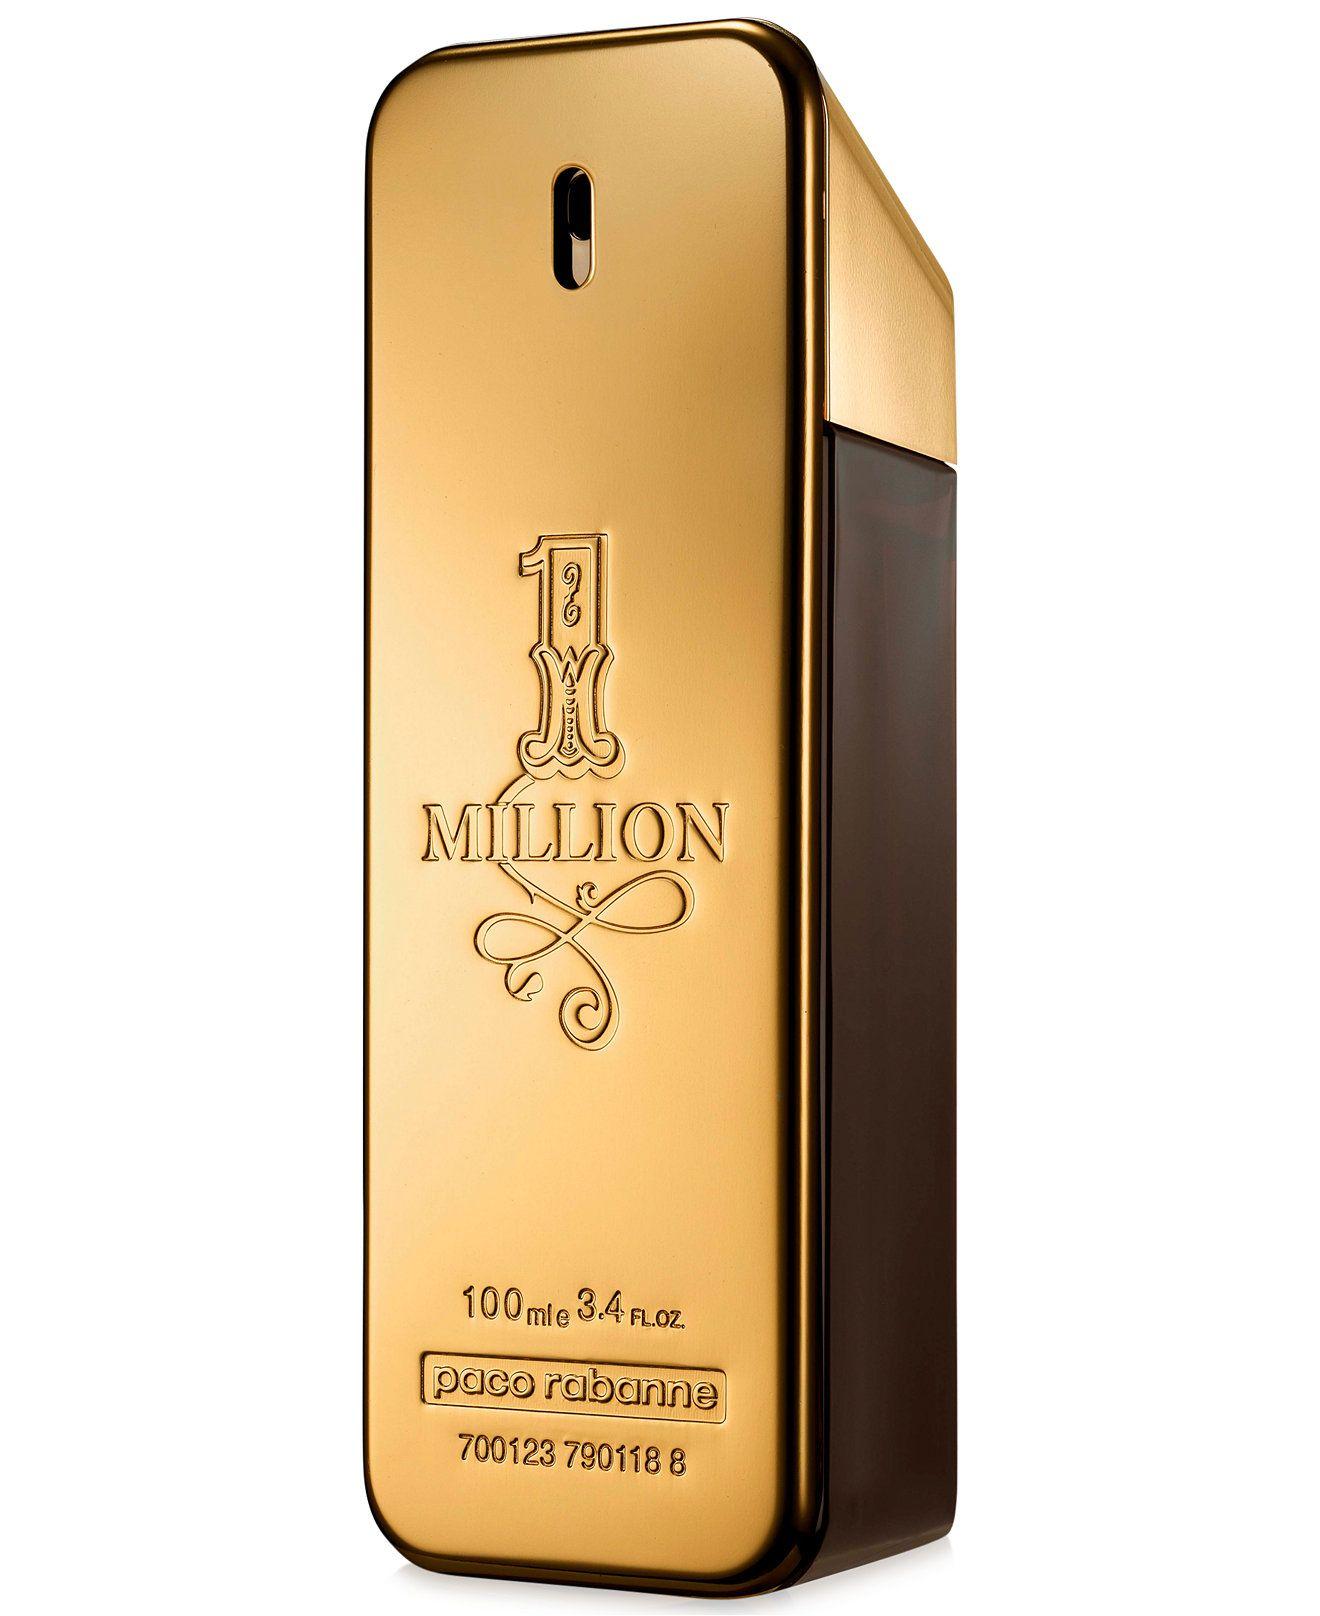 Paco Rabanne Men S 1 Million Eau De Toilette Spray 1 7 Oz Reviews Shop All Brands Beauty Macy S In 2021 Paco Rabanne Men Eau De Toilette Men Perfume